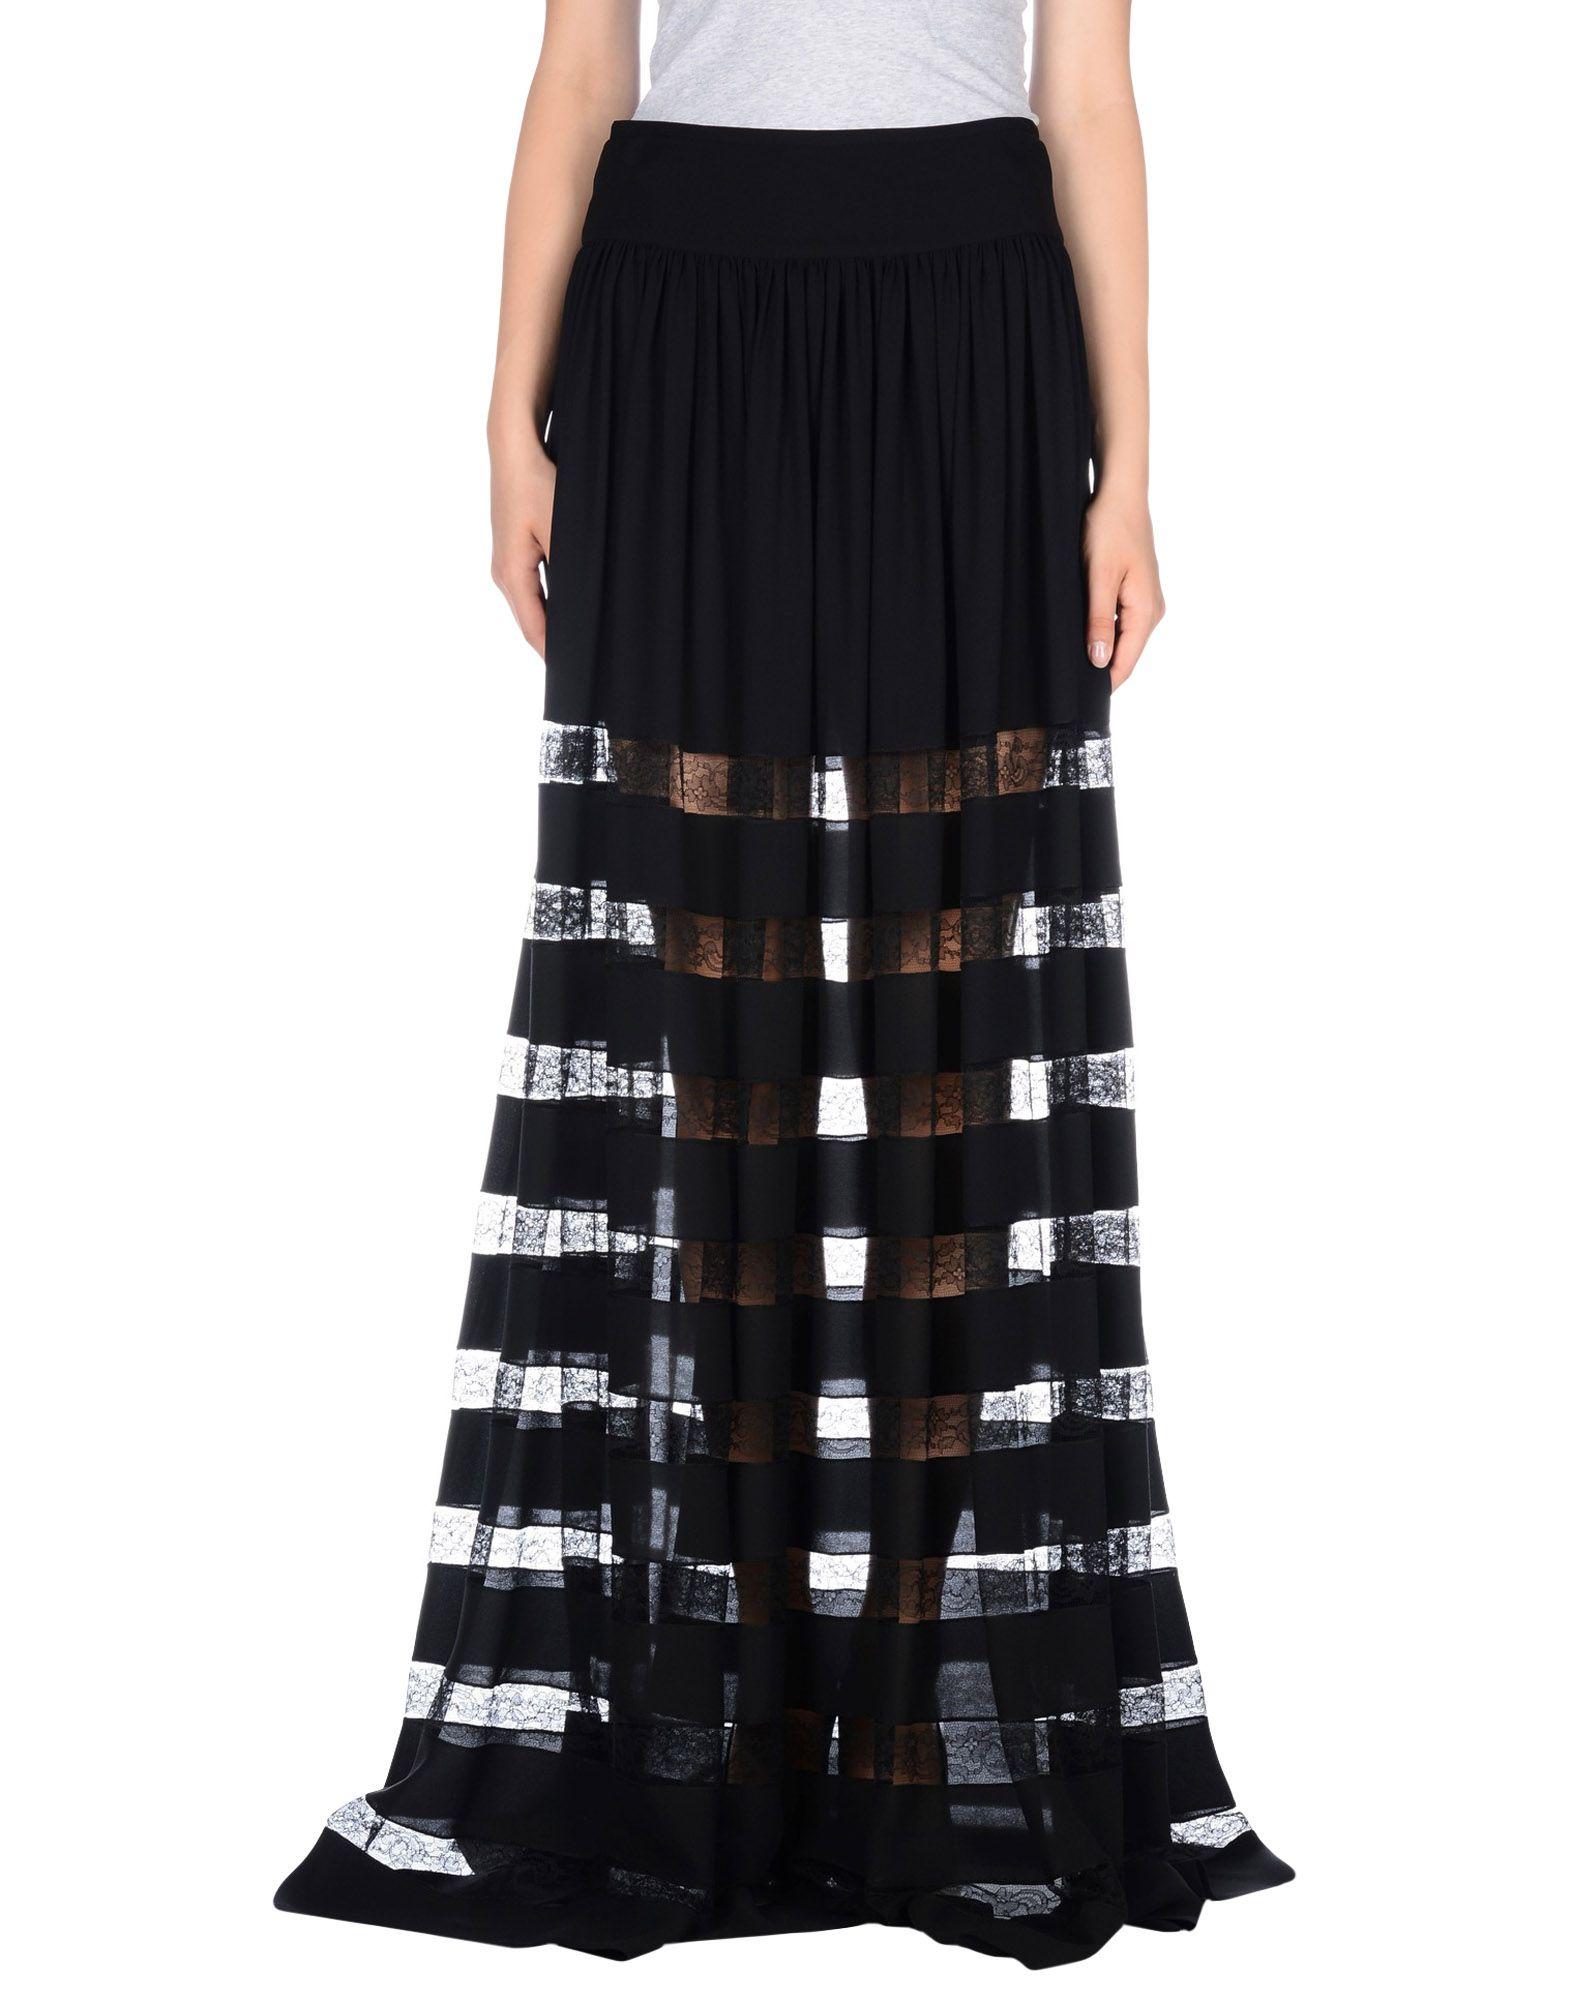 Фото - MICHAEL KORS COLLECTION Длинная юбка michael kors collection юбка длиной 3 4